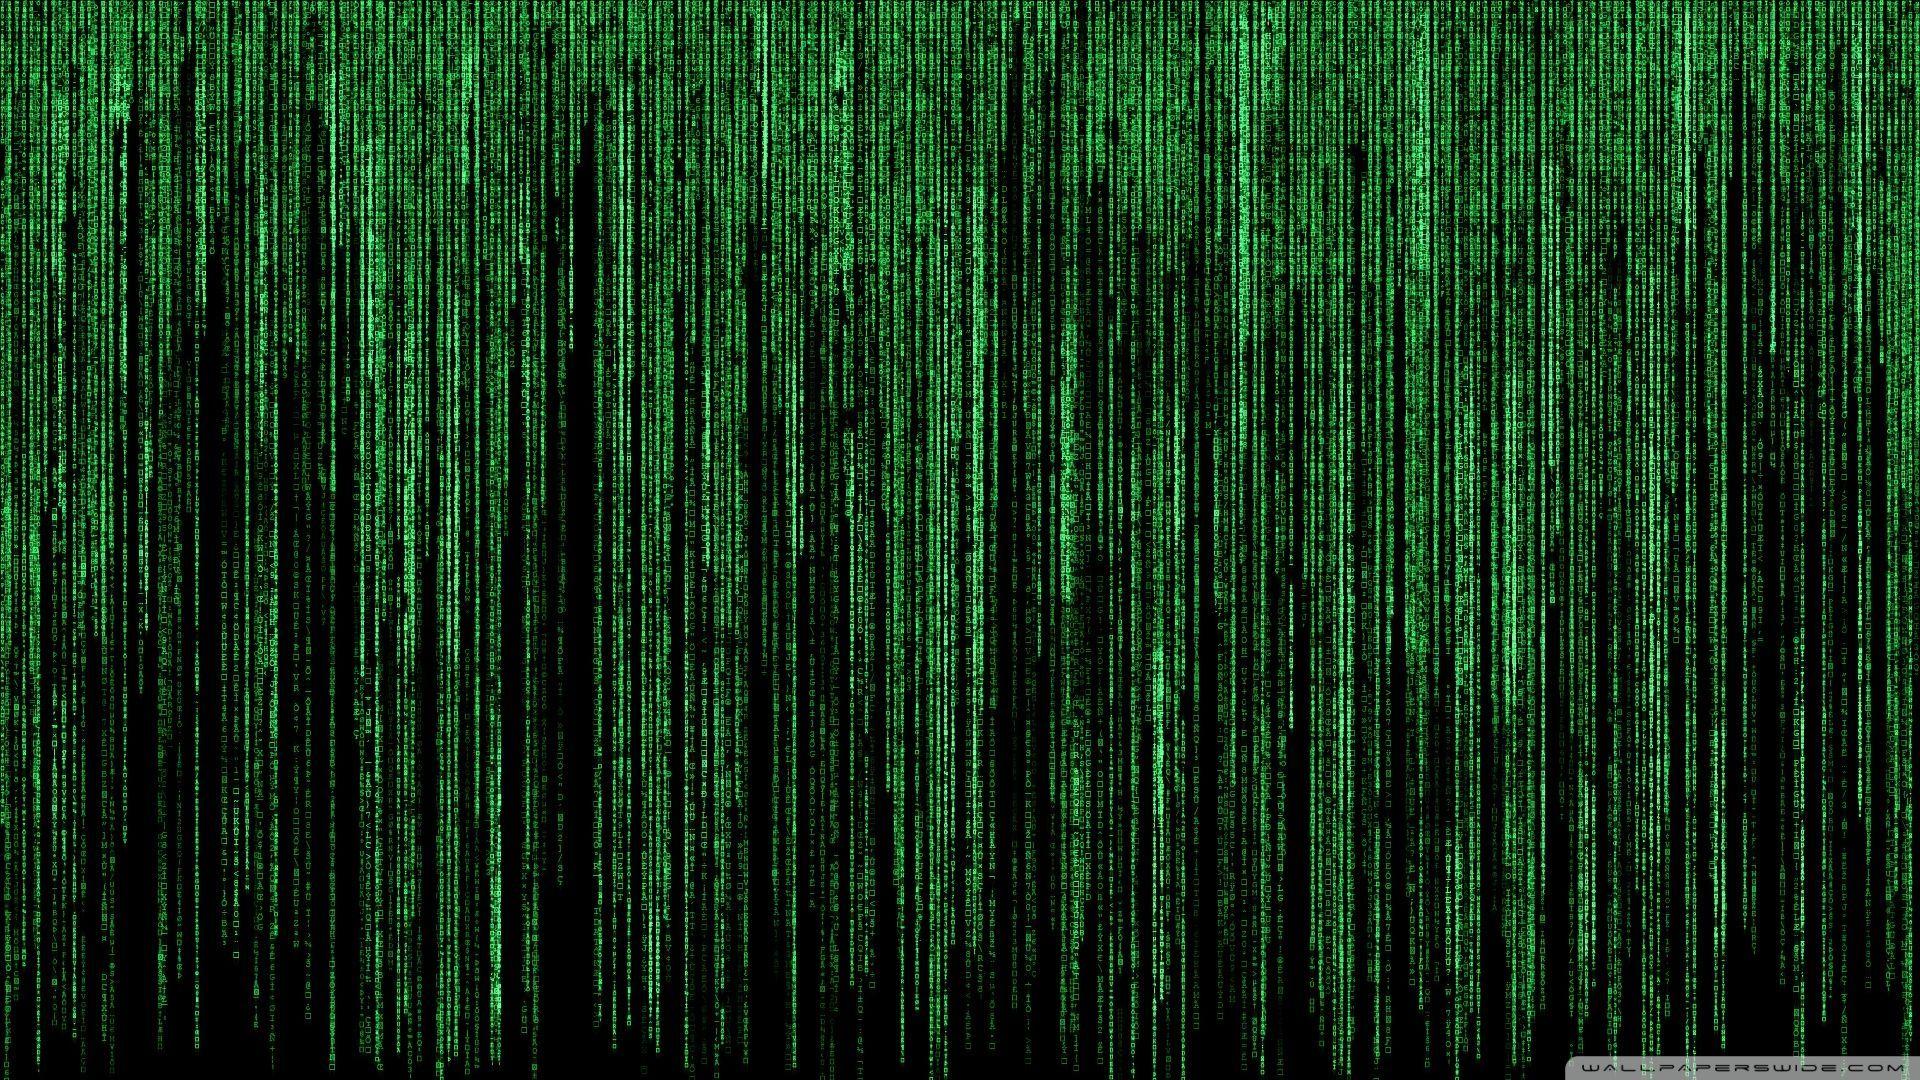 4k Matrix Wallpapers Top Free 4k Matrix Backgrounds Wallpaperaccess In 2020 Desktop Wallpapers Backgrounds Hd Wallpaper Hd Desktop